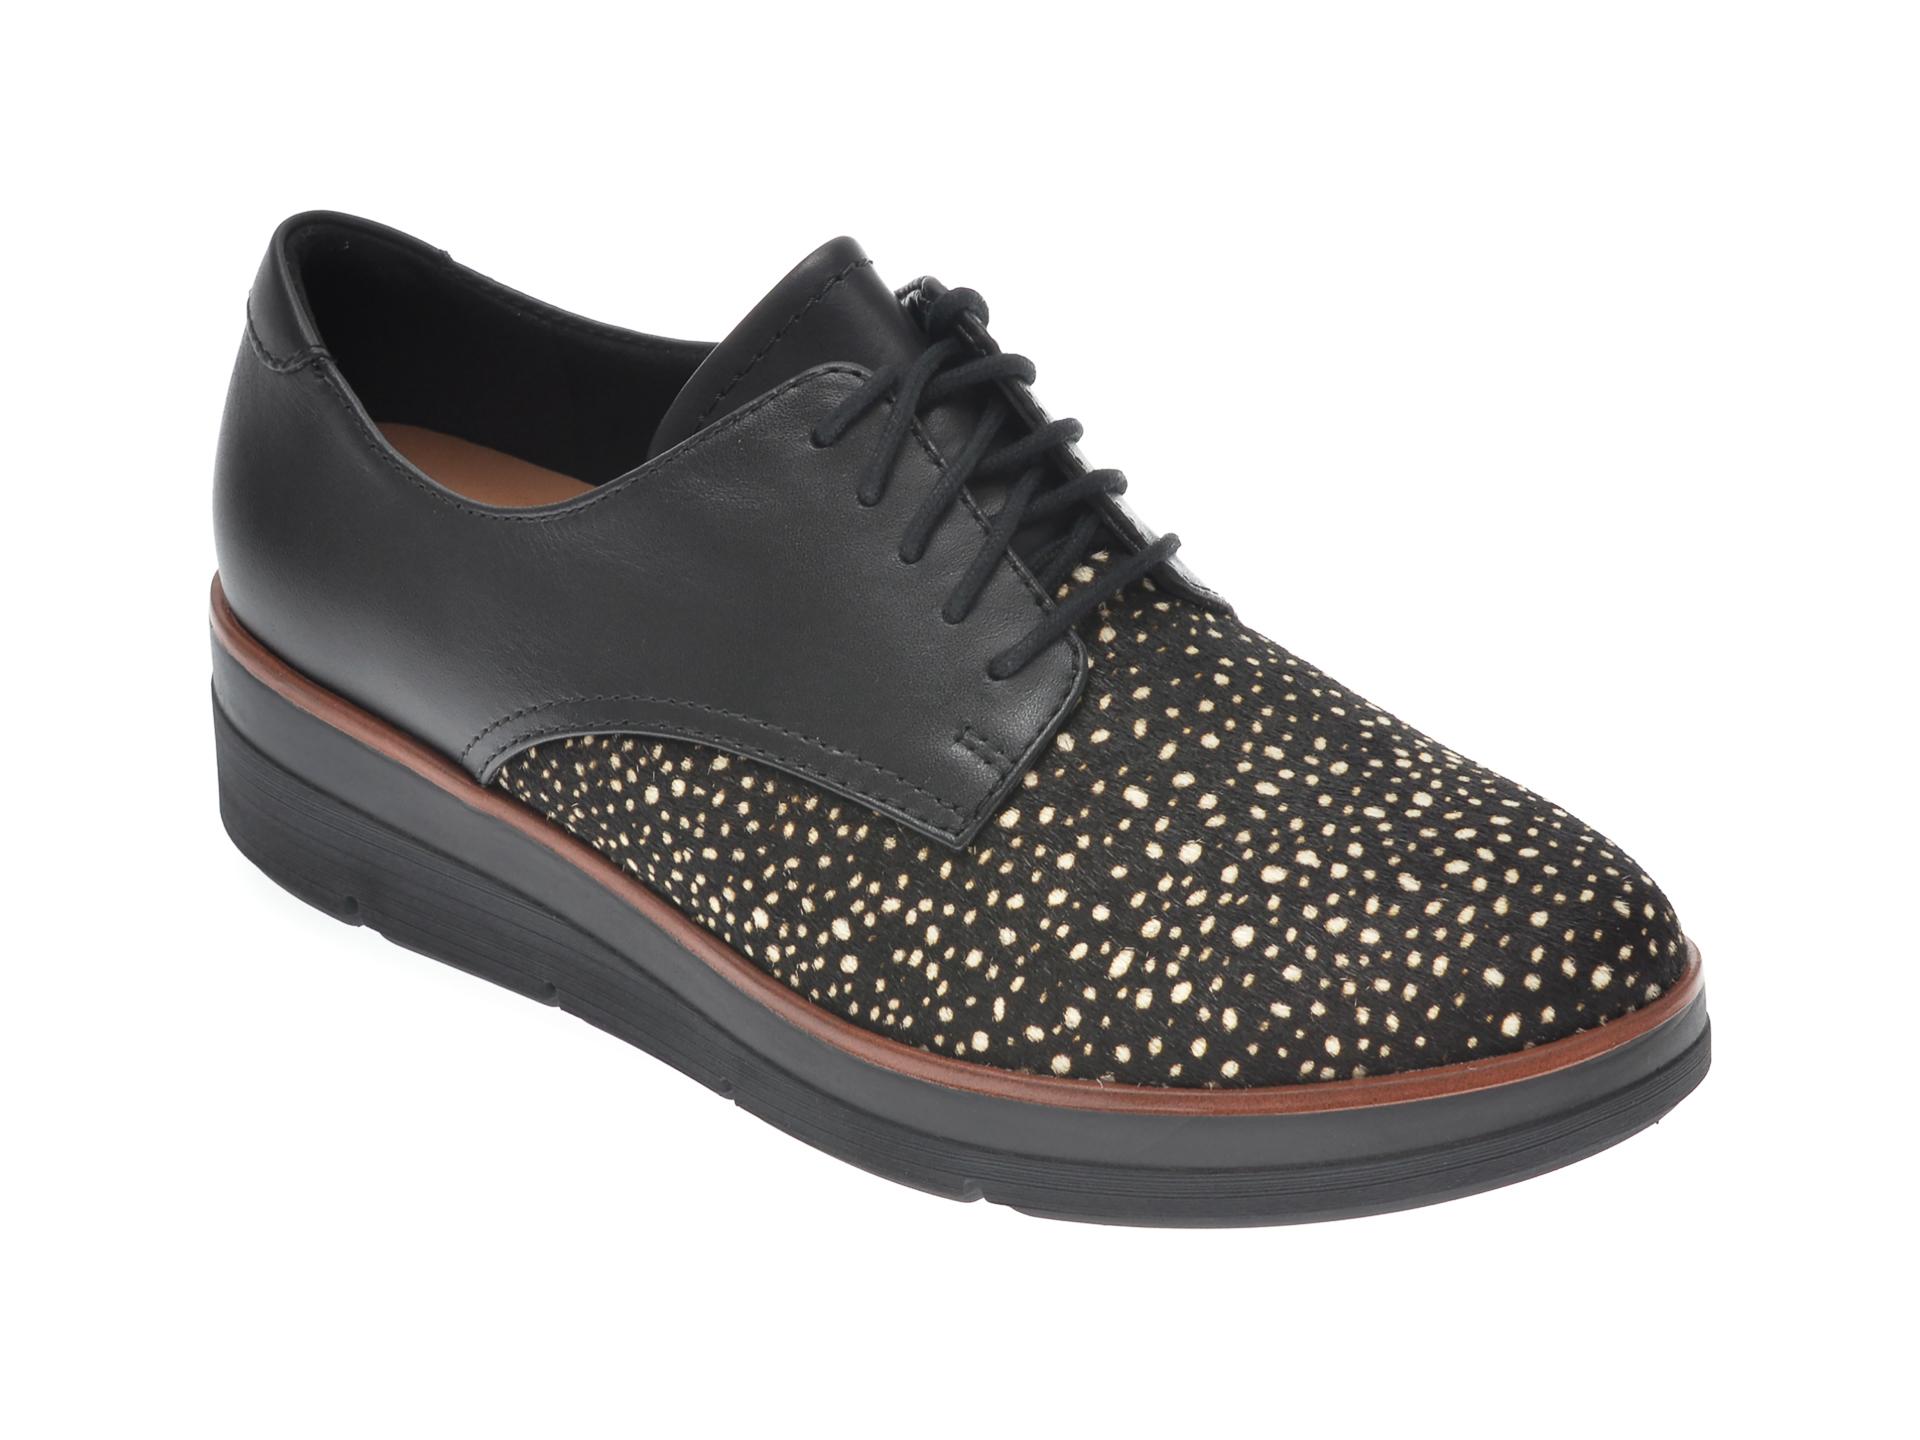 Pantofi CLARKS negri, SHAYLIN LACE, din piele naturala imagine